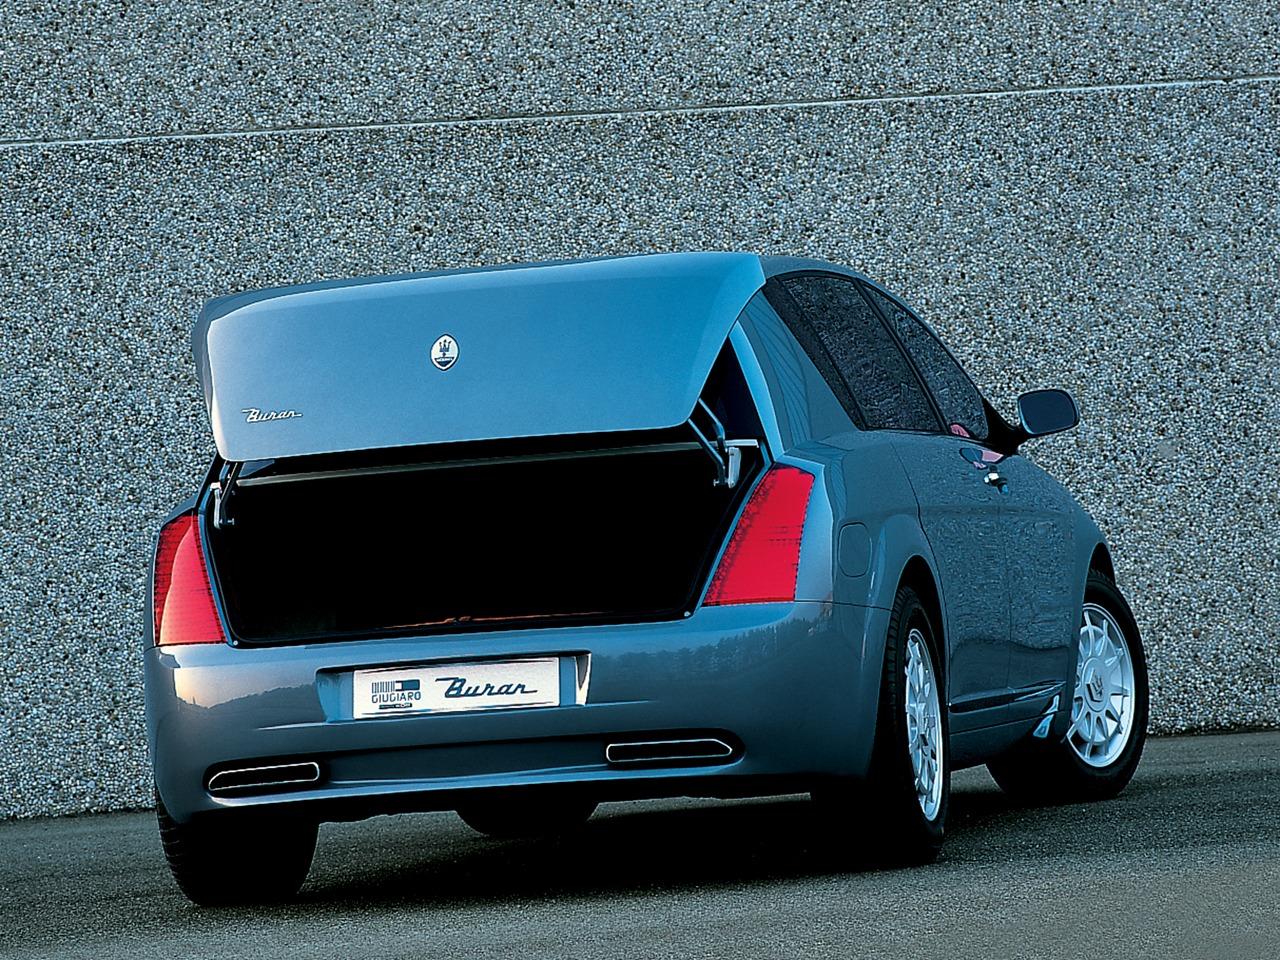 Volkswagen Near Me >> Maserati Buran Concept (2000) - Old Concept Cars